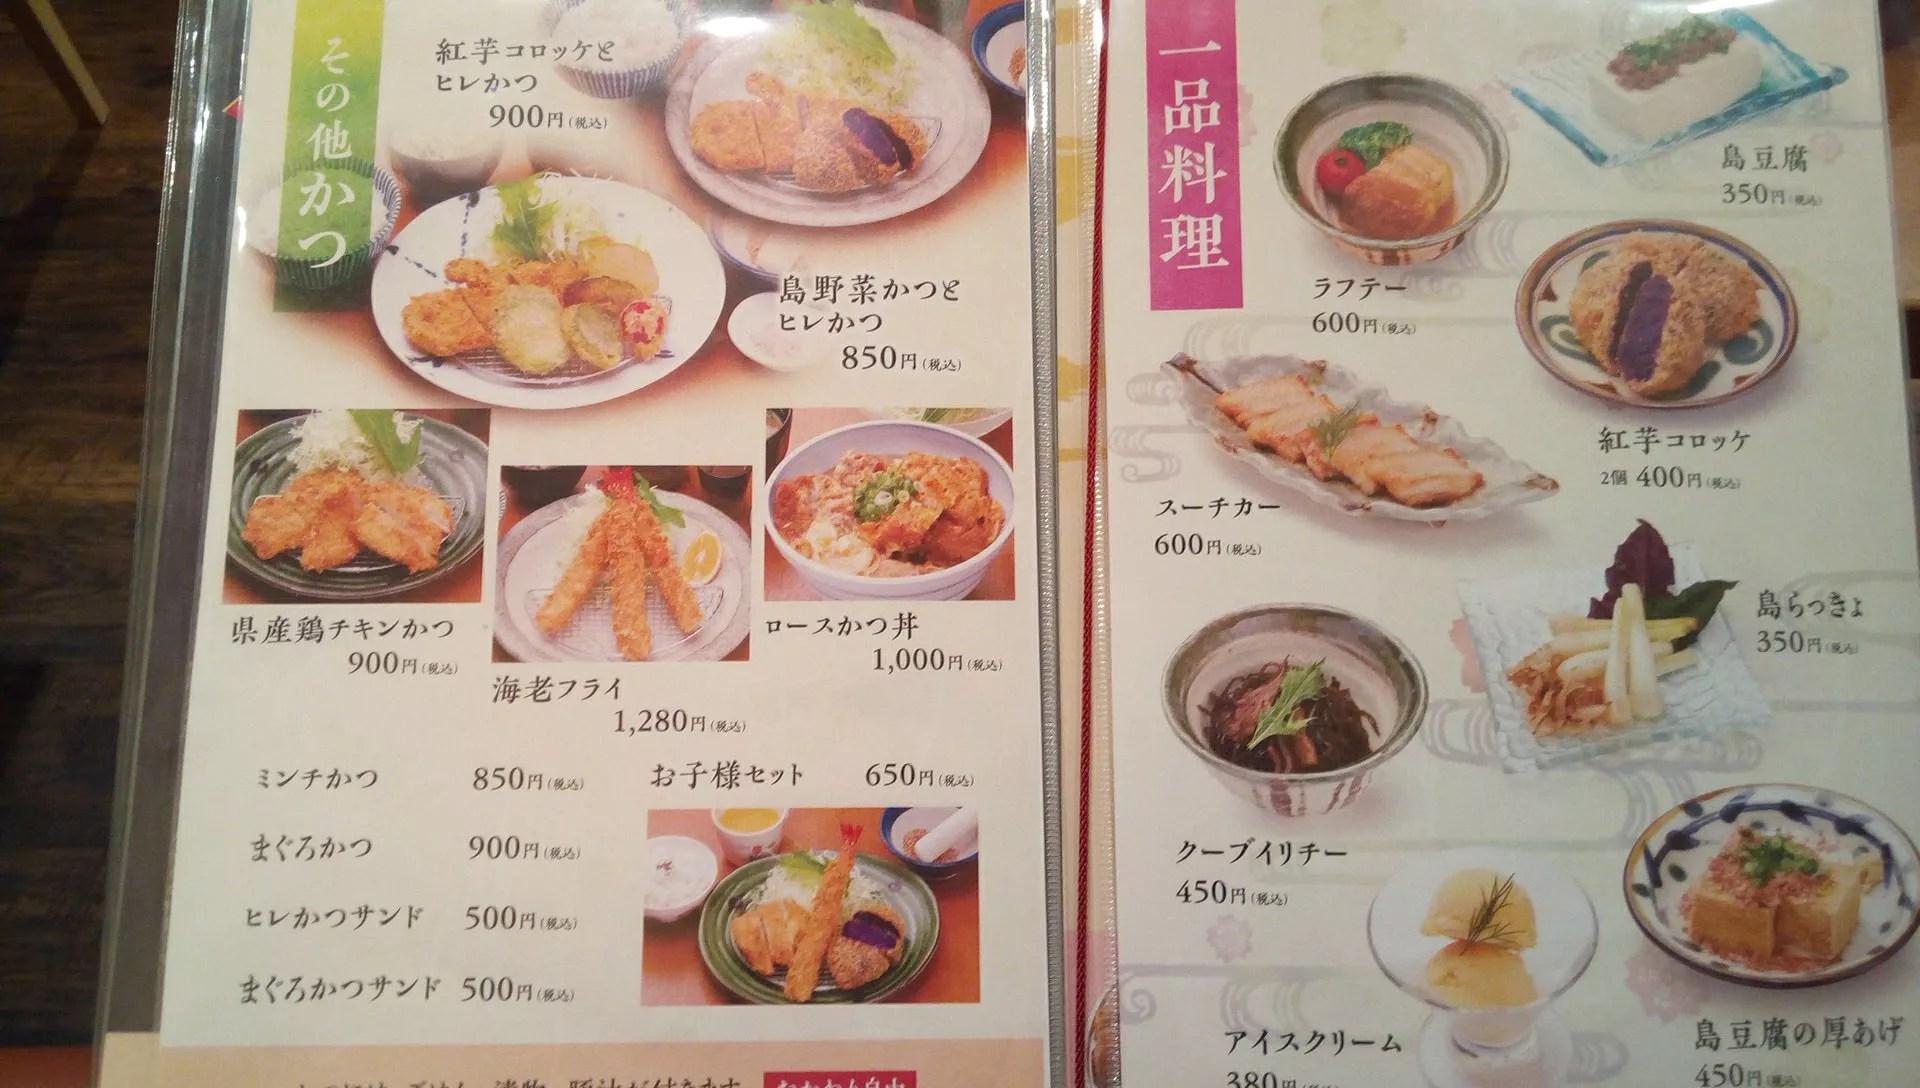 the menu of Cochon 2